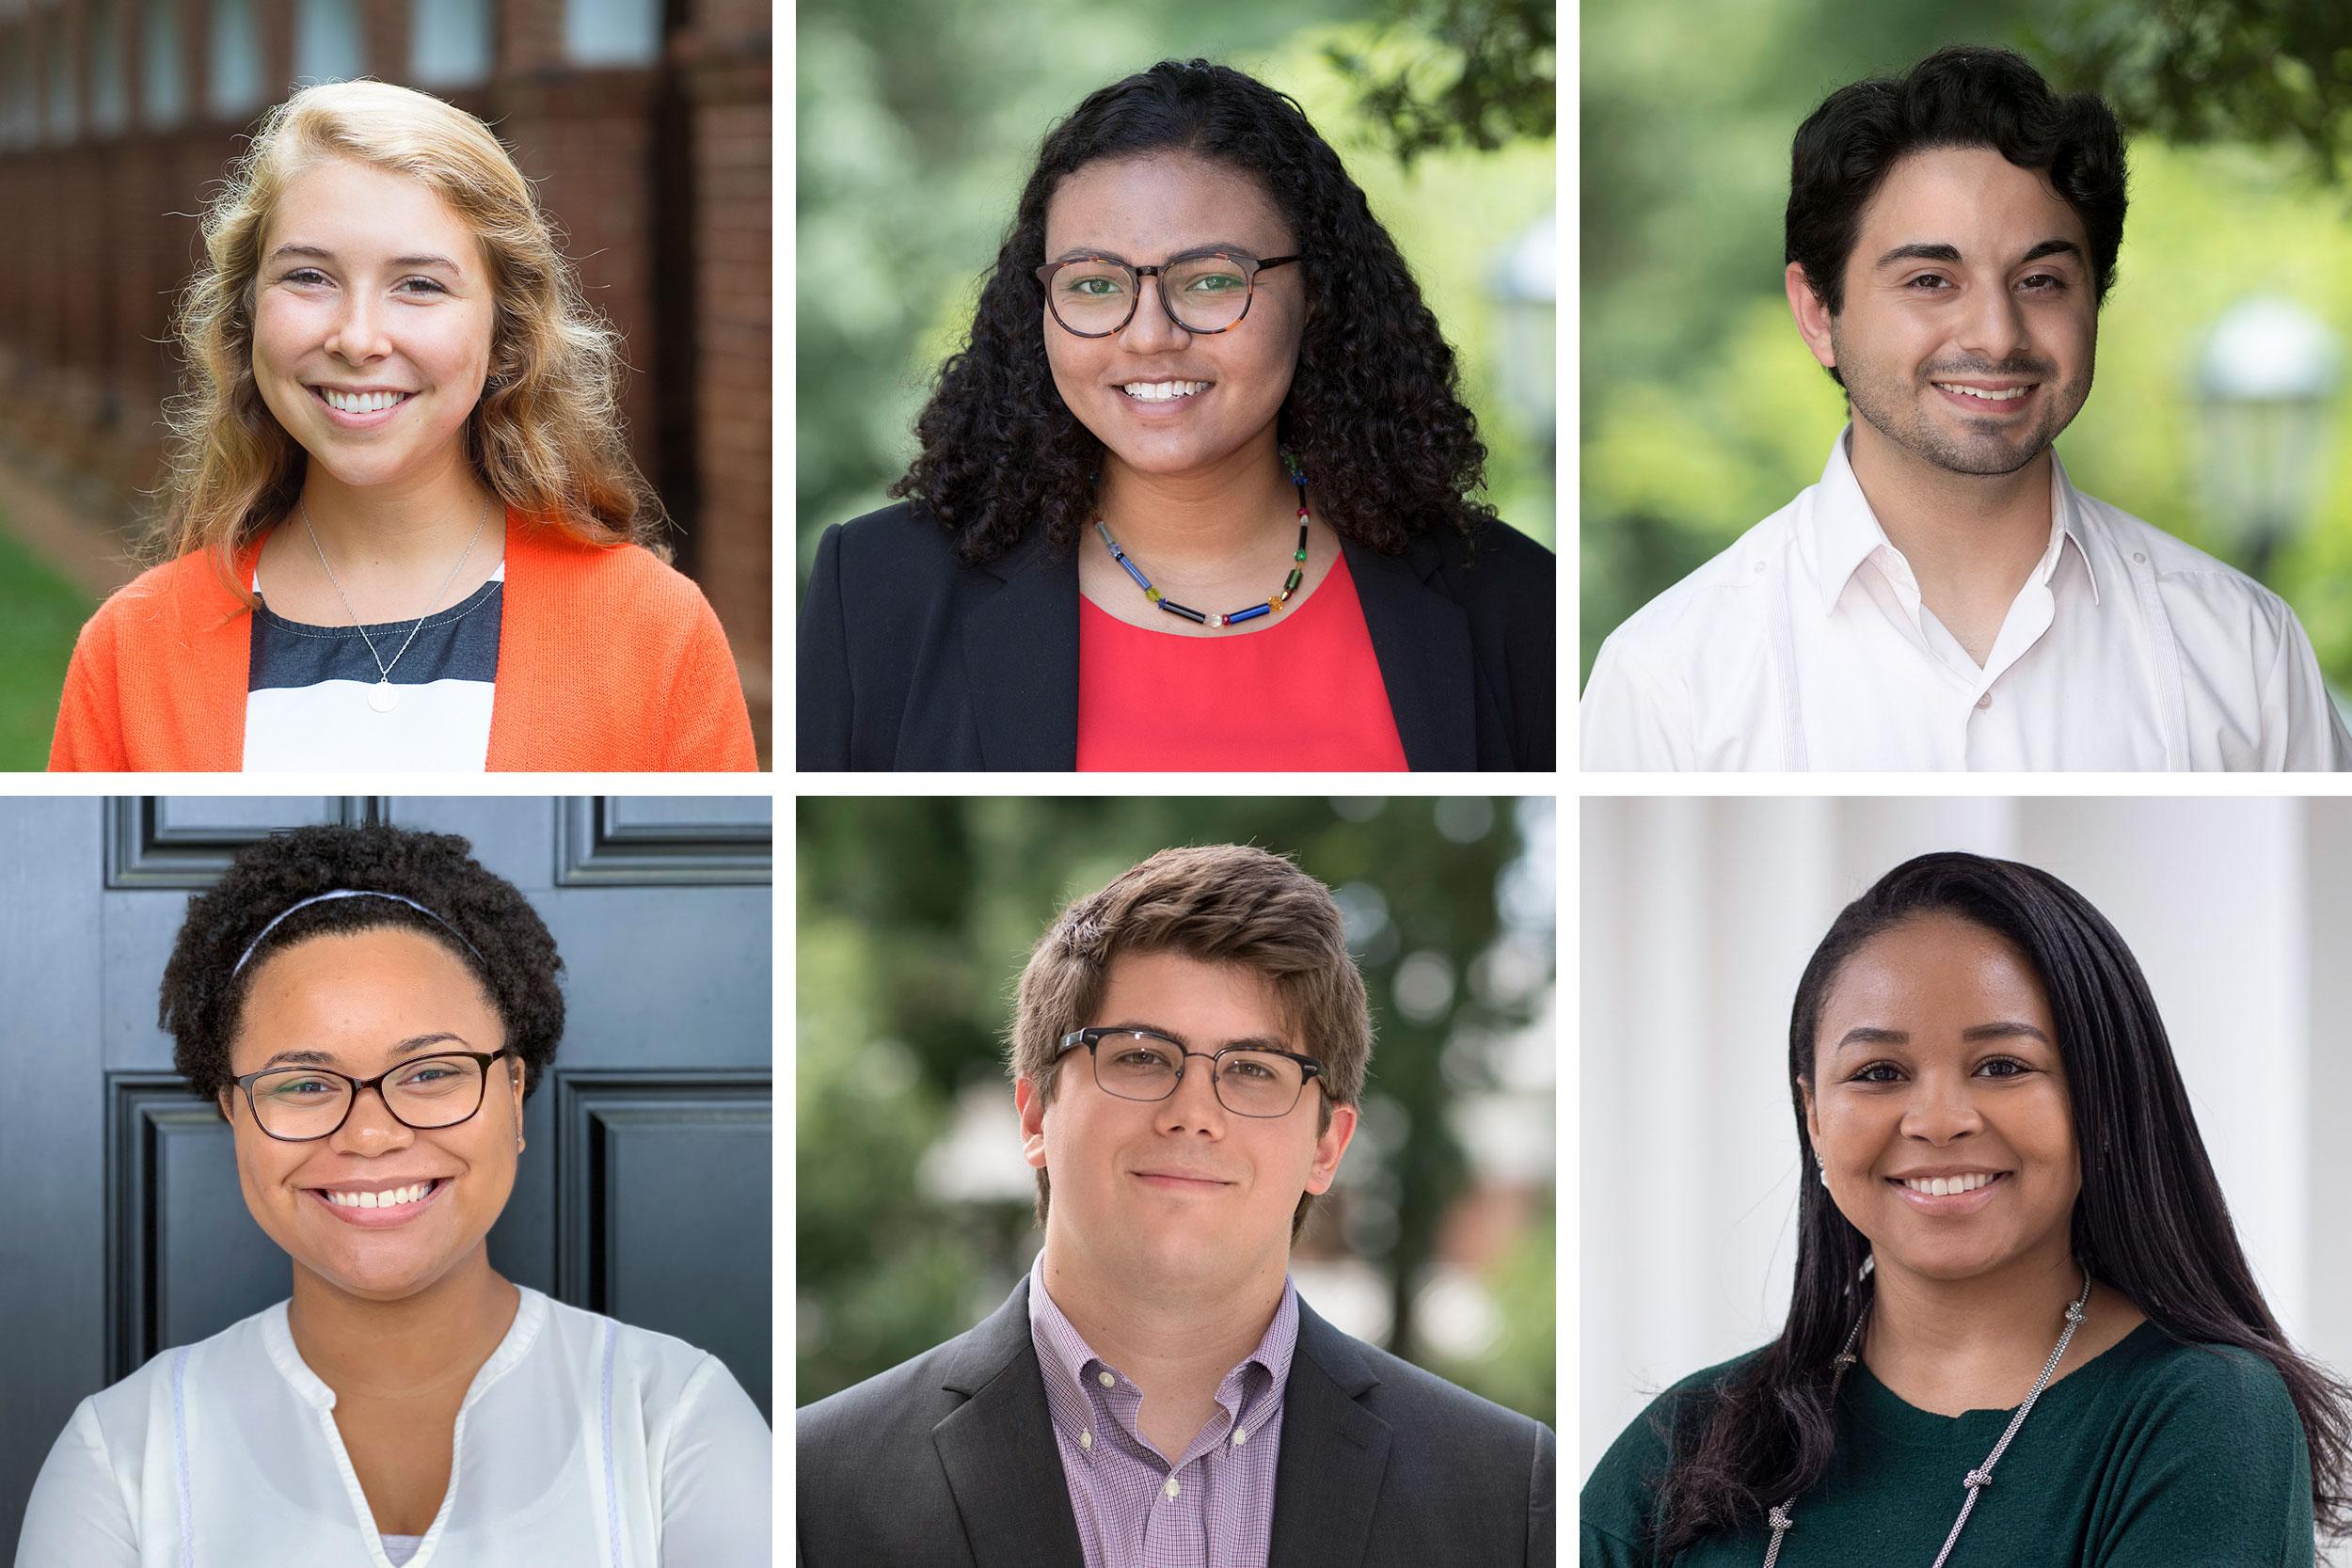 UVA's Governor's Fellows: top row, from left, Grace Blanchard, Virginia Chambers and Alex Cintron; bottom row, from left, Natasha Coleman, Sam Lesemann and Kiara Rogers.